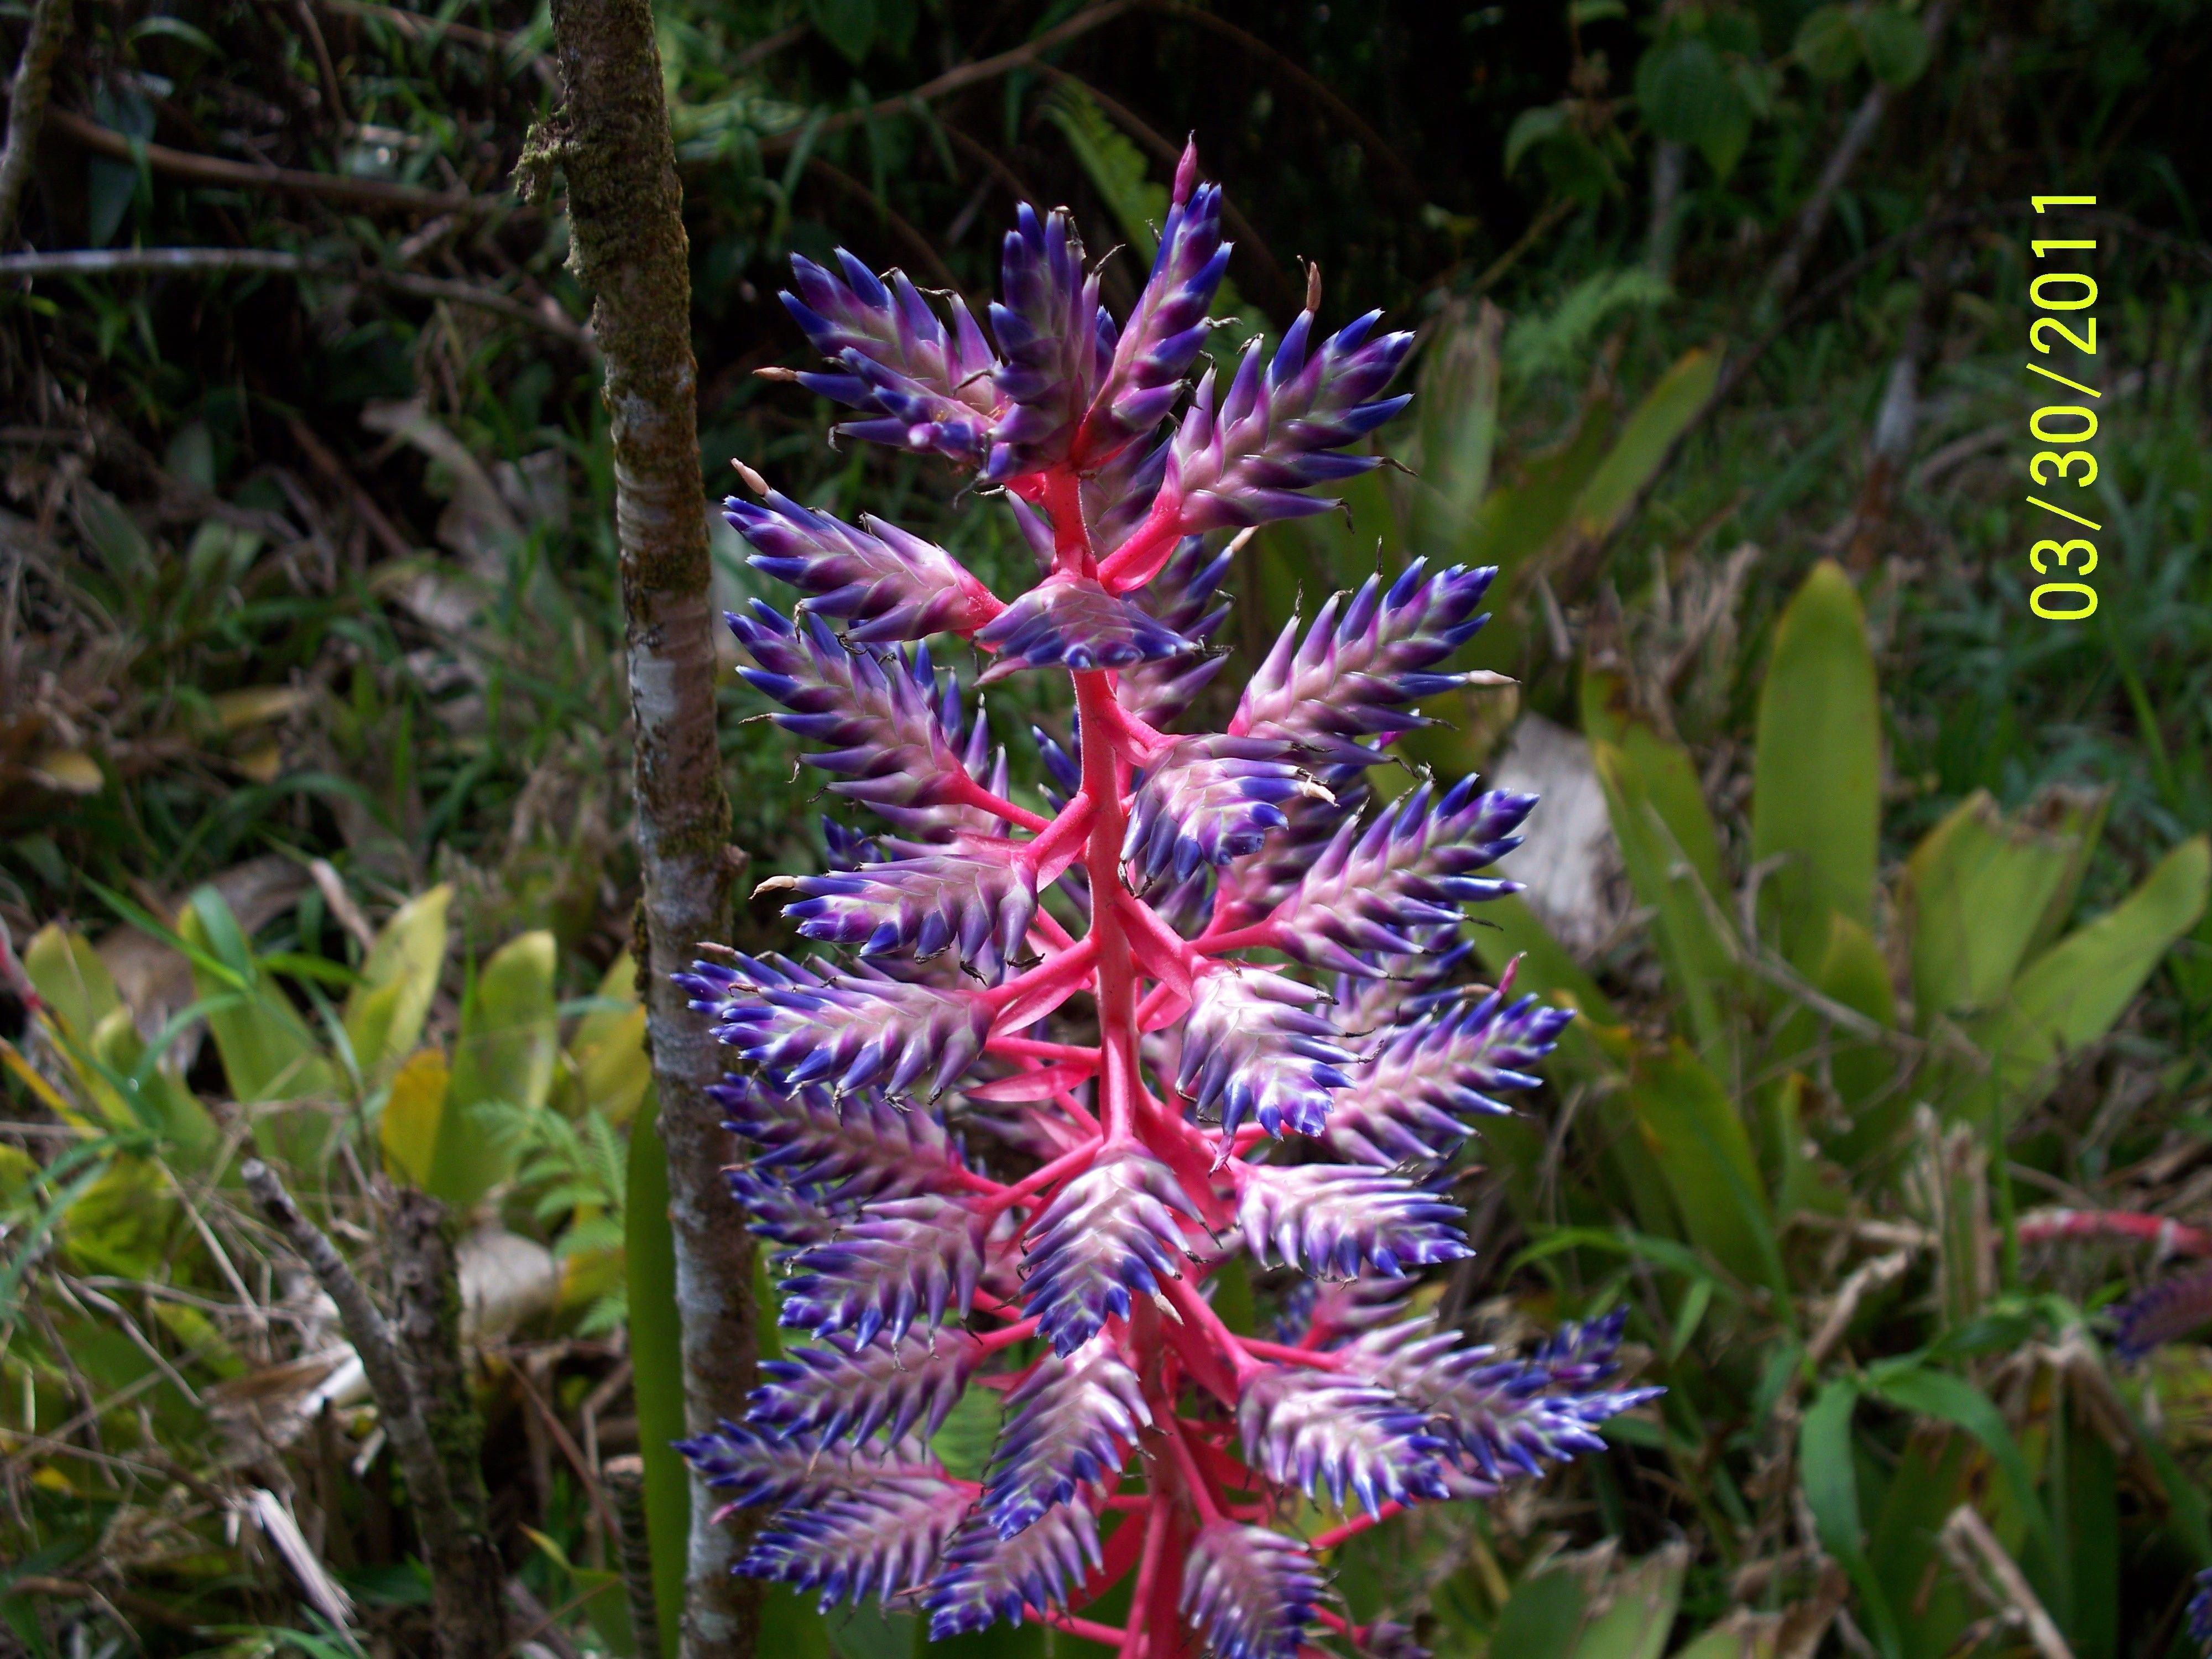 Bromeliad blooming in Hana,Maui